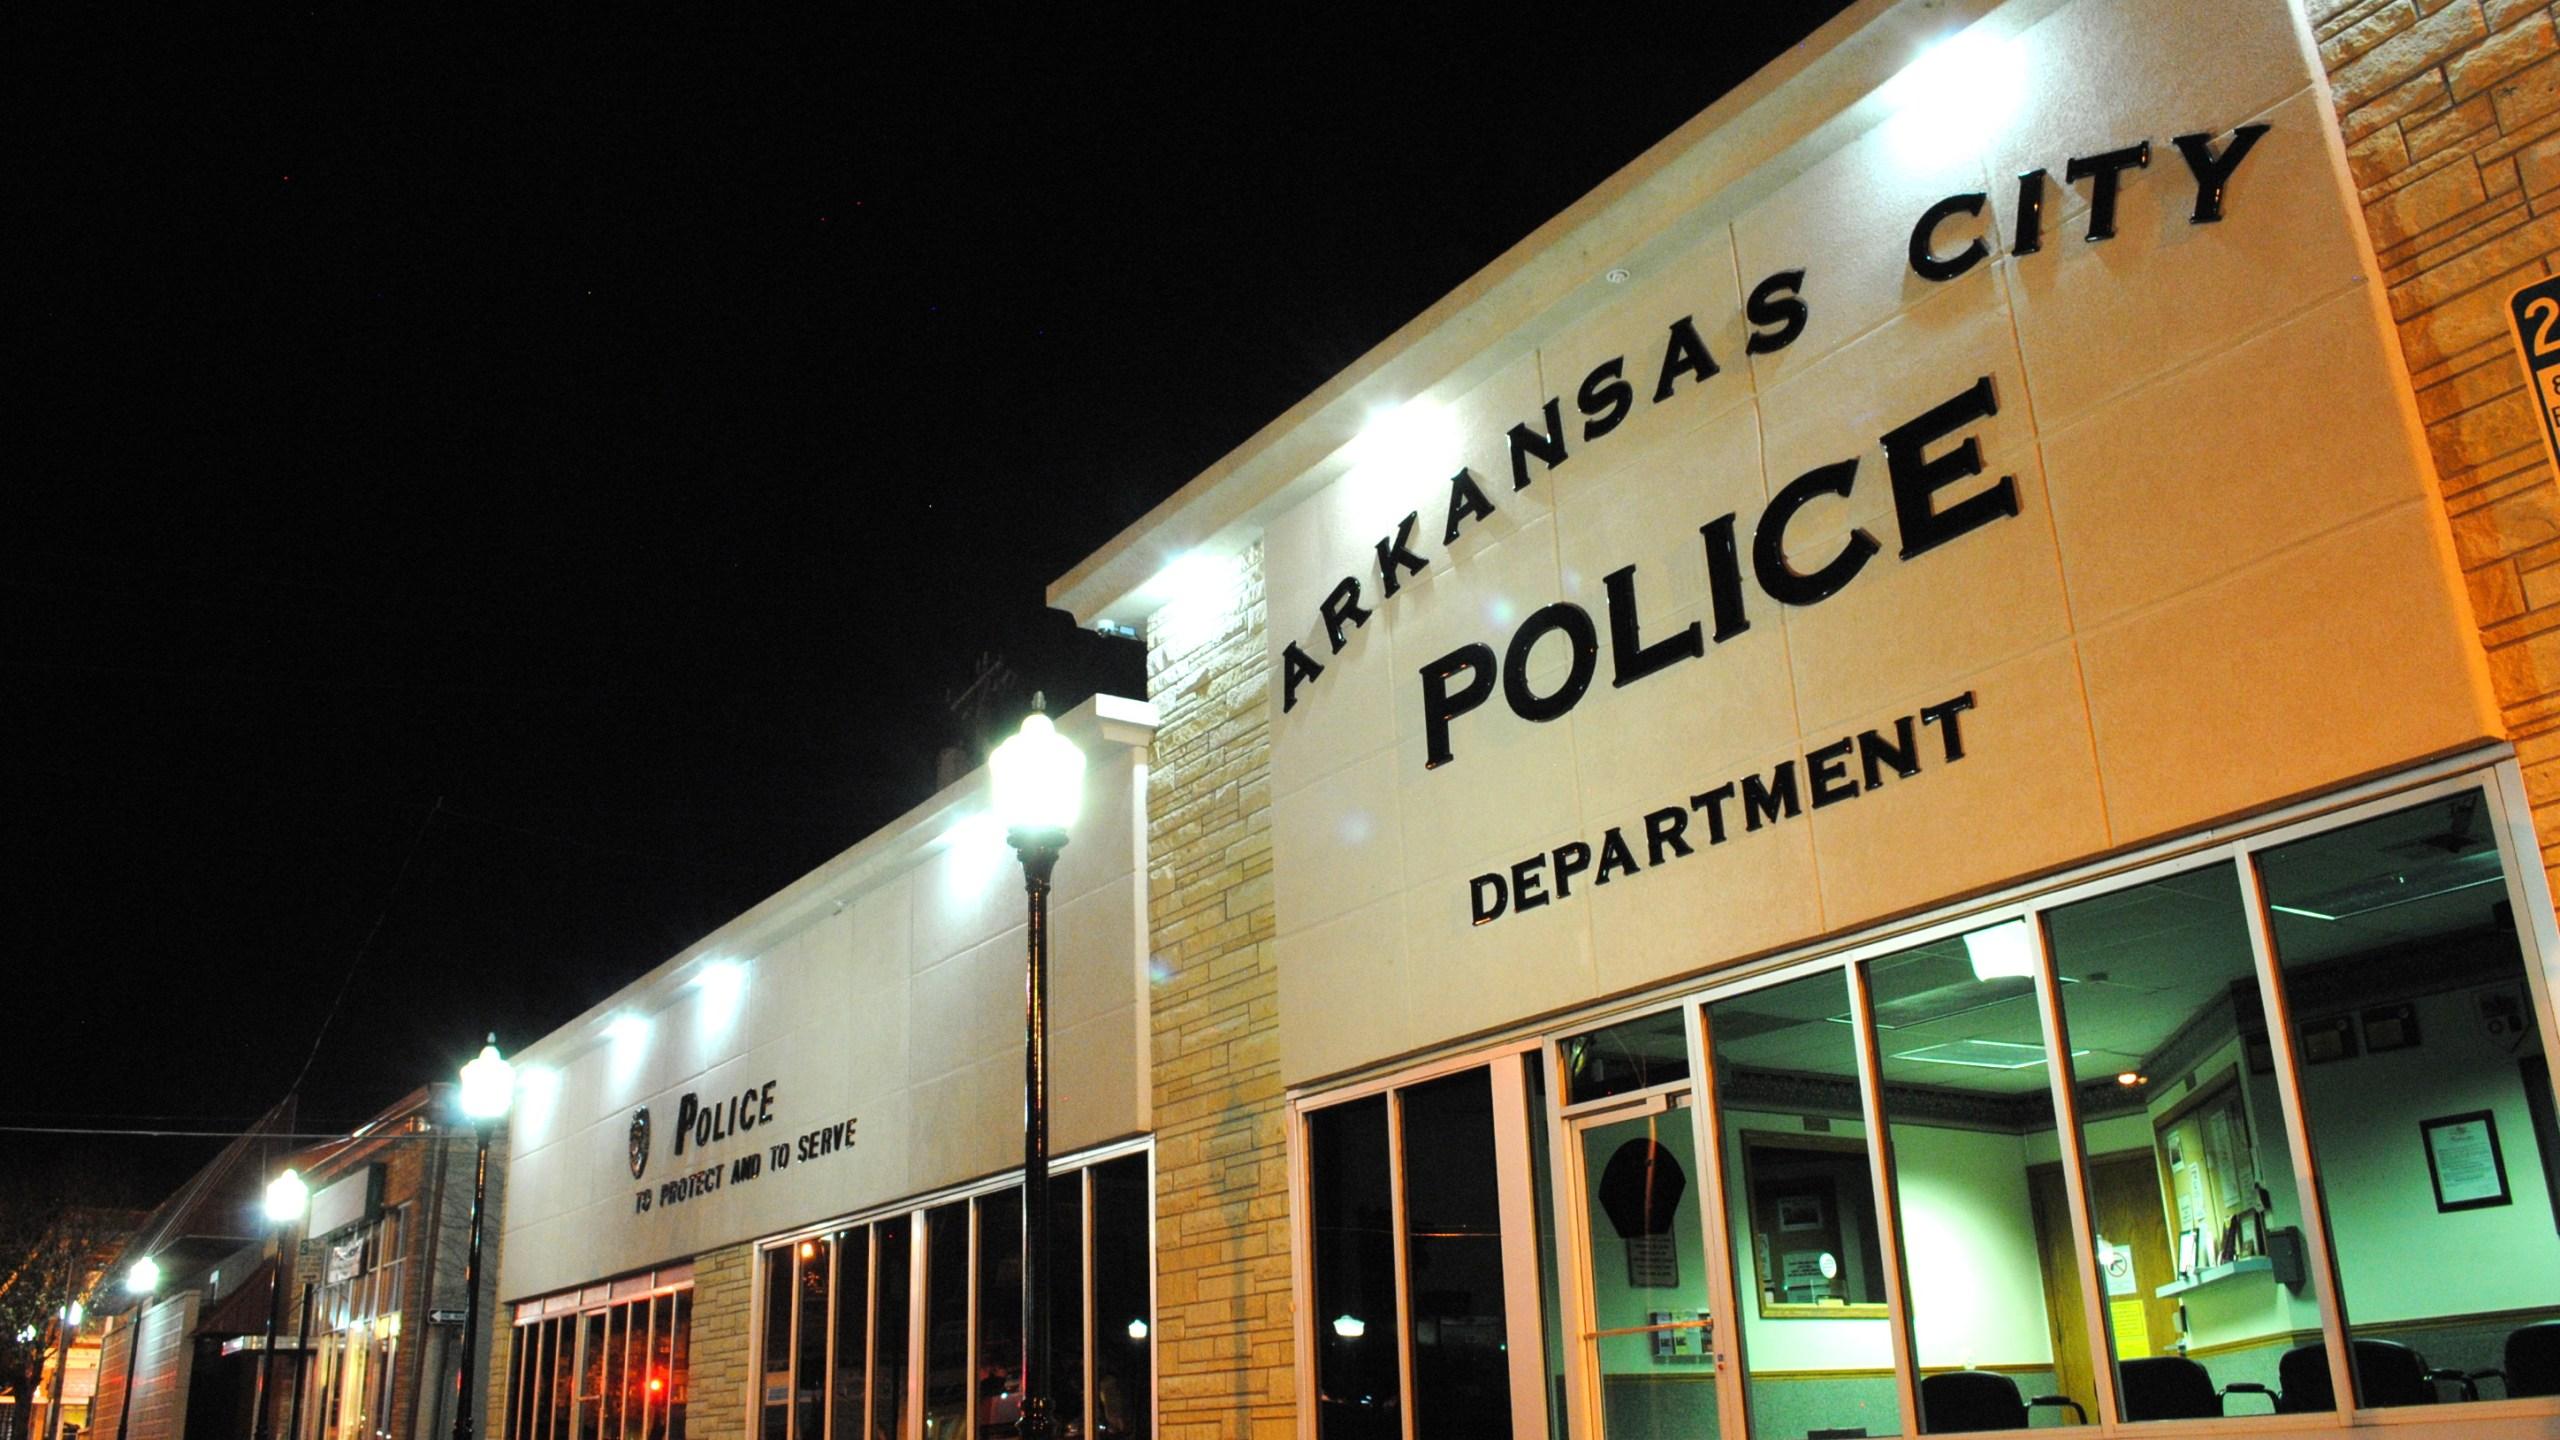 ark city police_177233